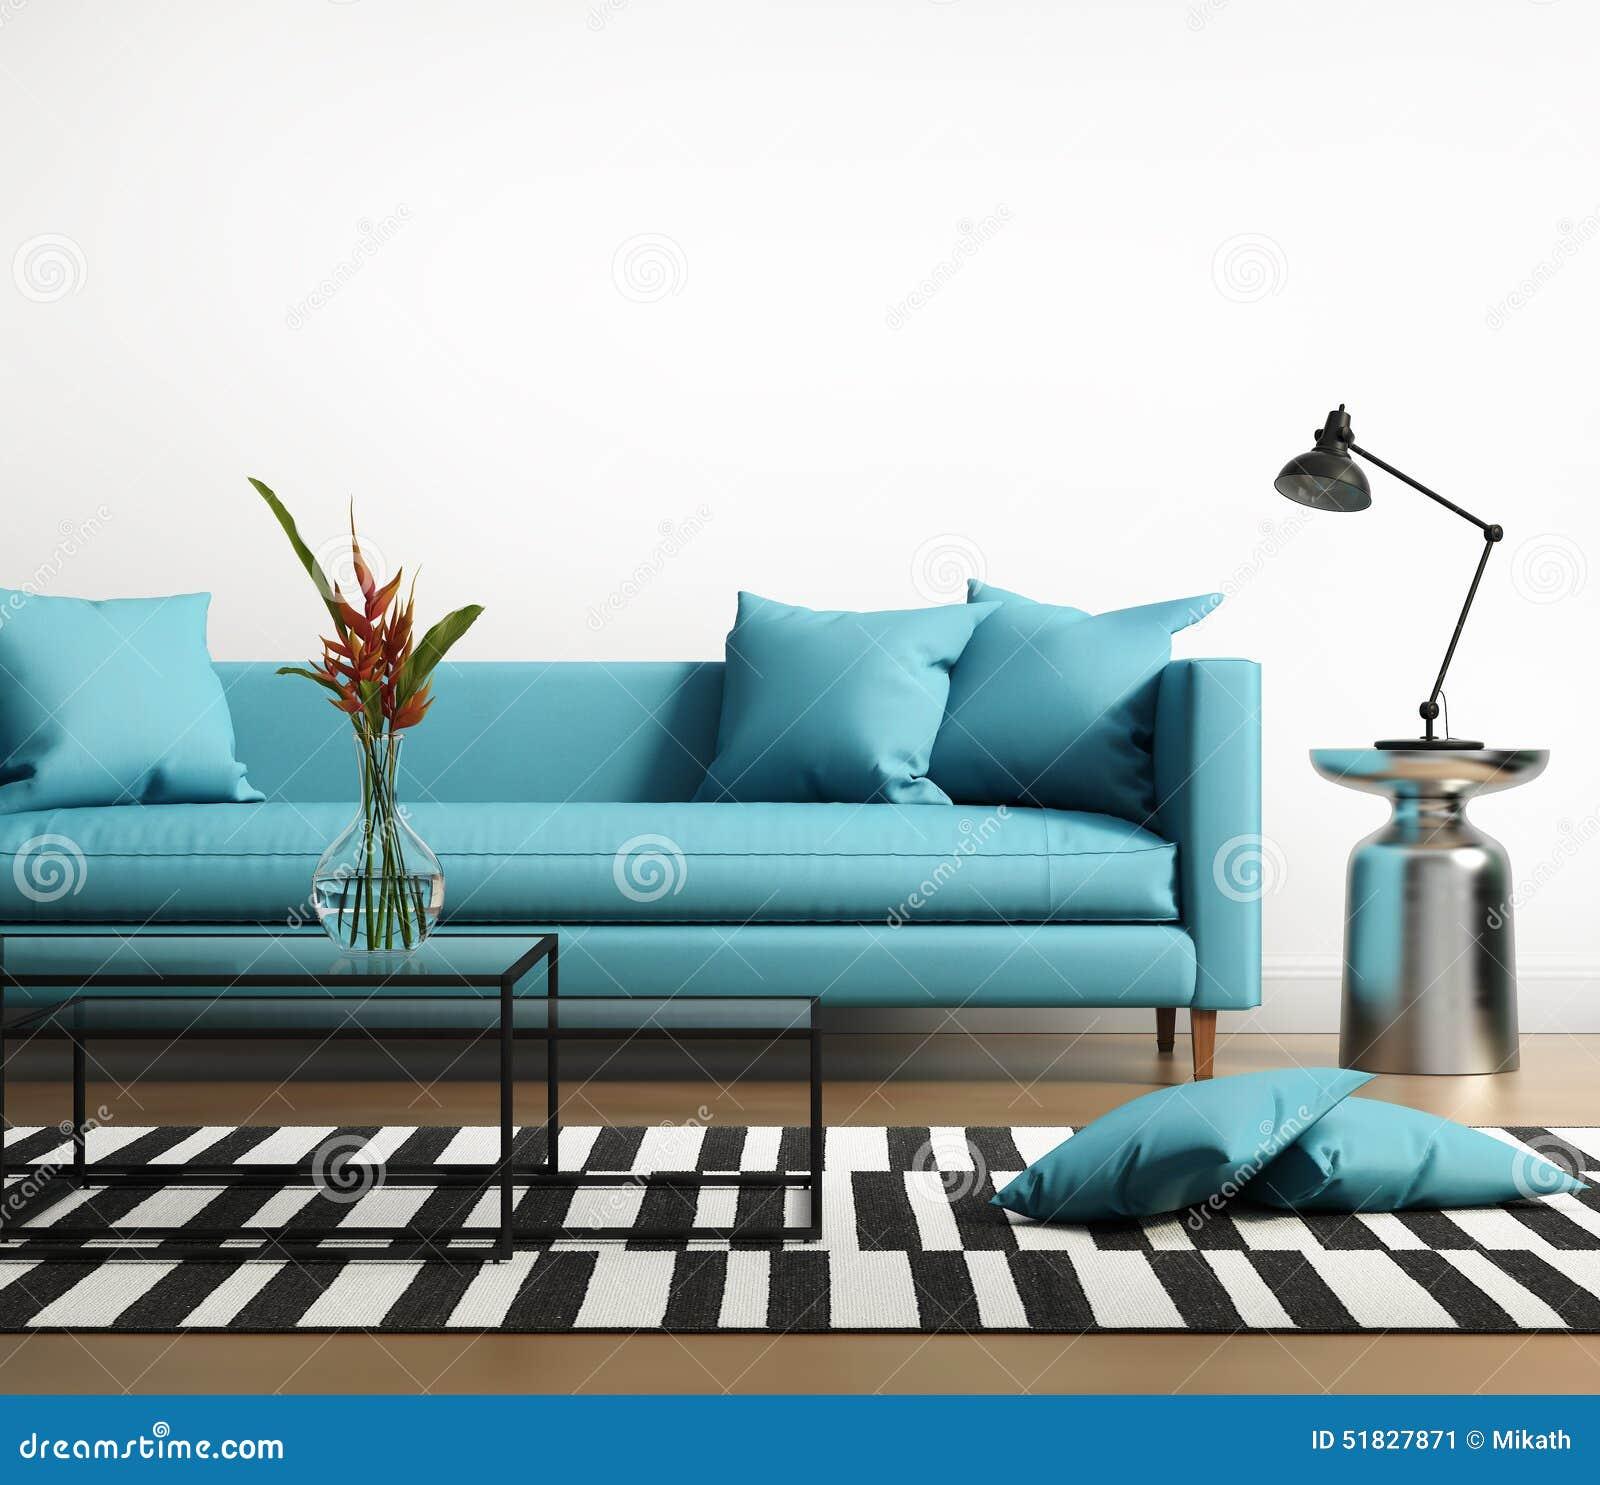 Modern binnenland met een blauwe turkooise bank in de woonkamer stock foto afbeelding 51827871 - Woonkamer deco ...